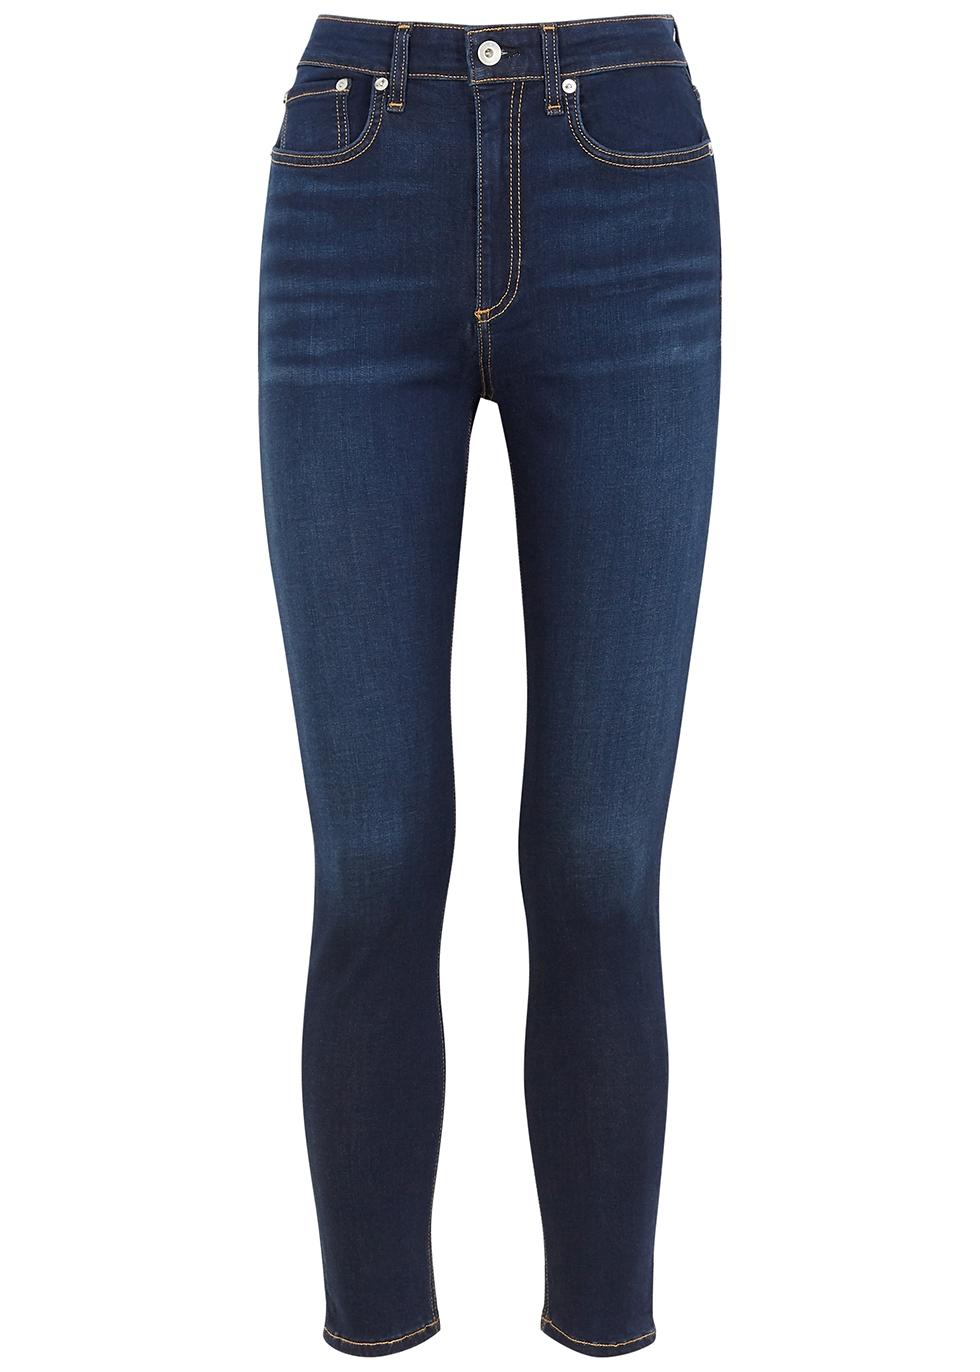 Nina indigo skinny jeans